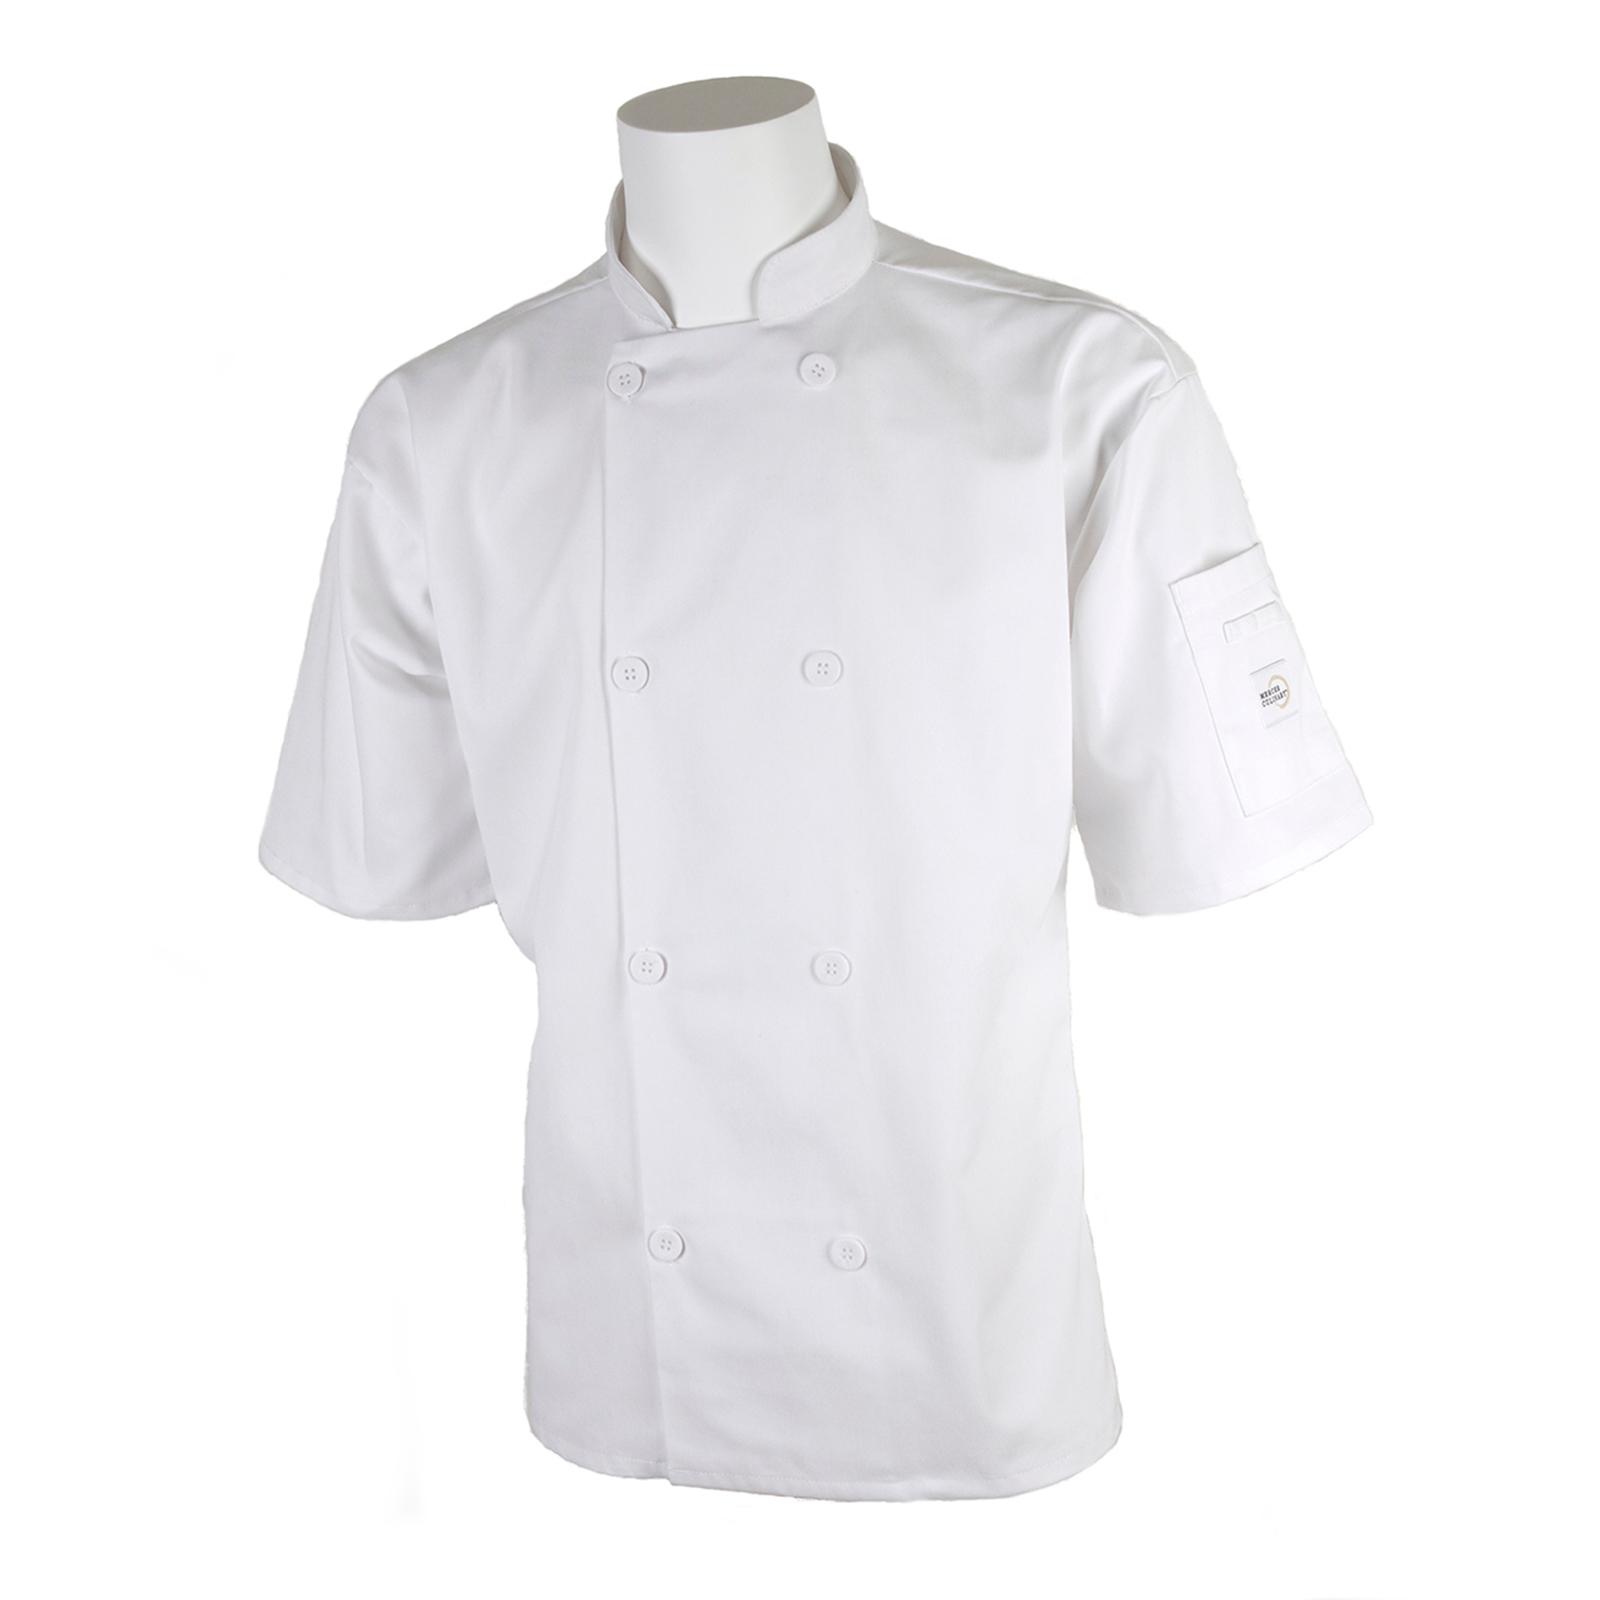 Mercer Culinary M60019WHXS chef's coat